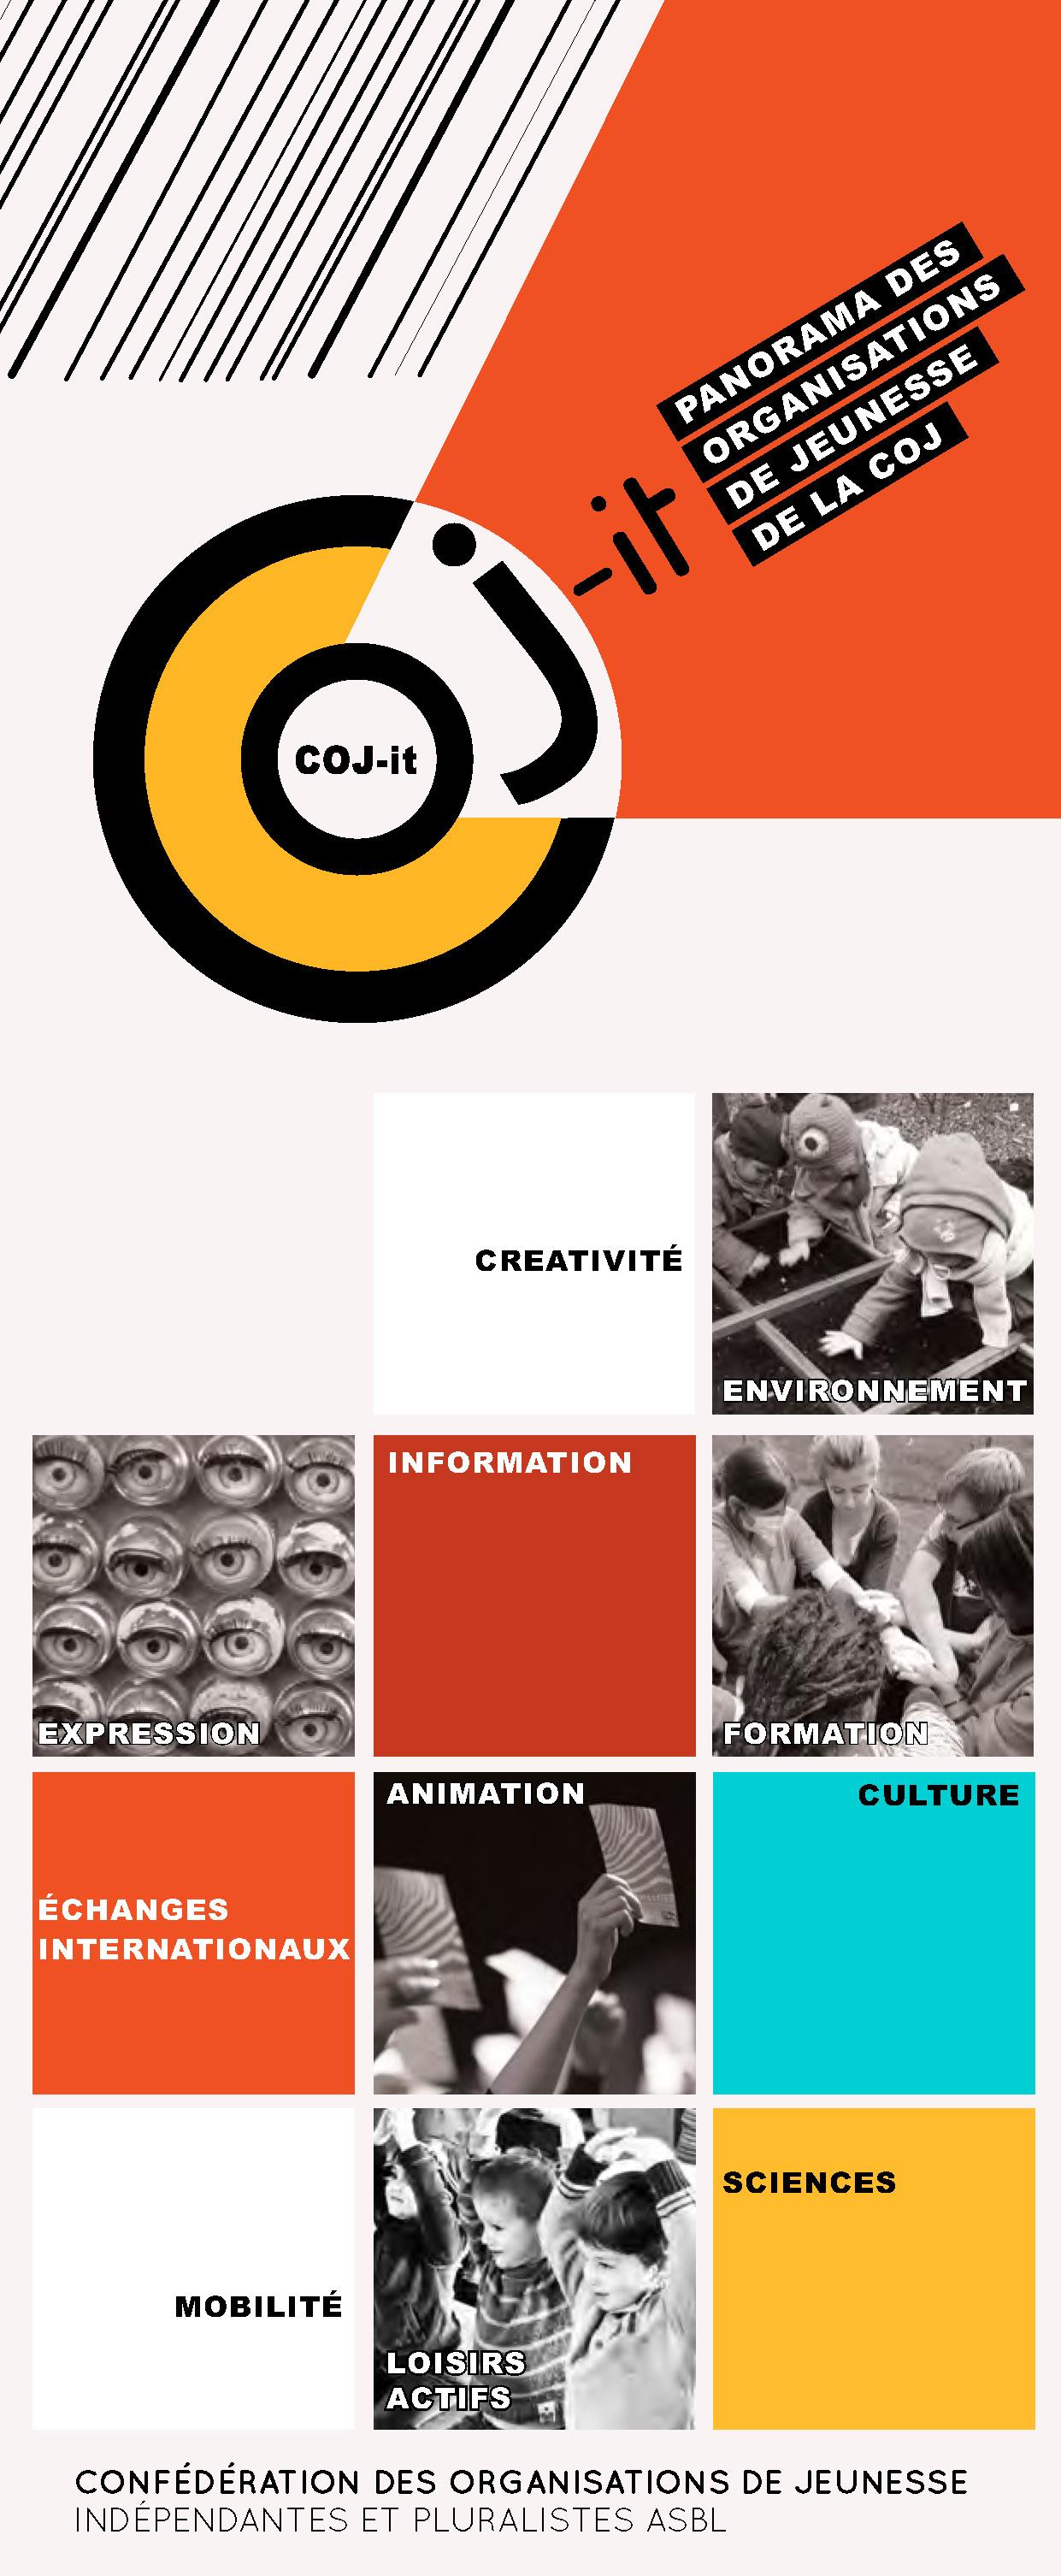 couv-COJ-it_contenu_09_29_2015_web